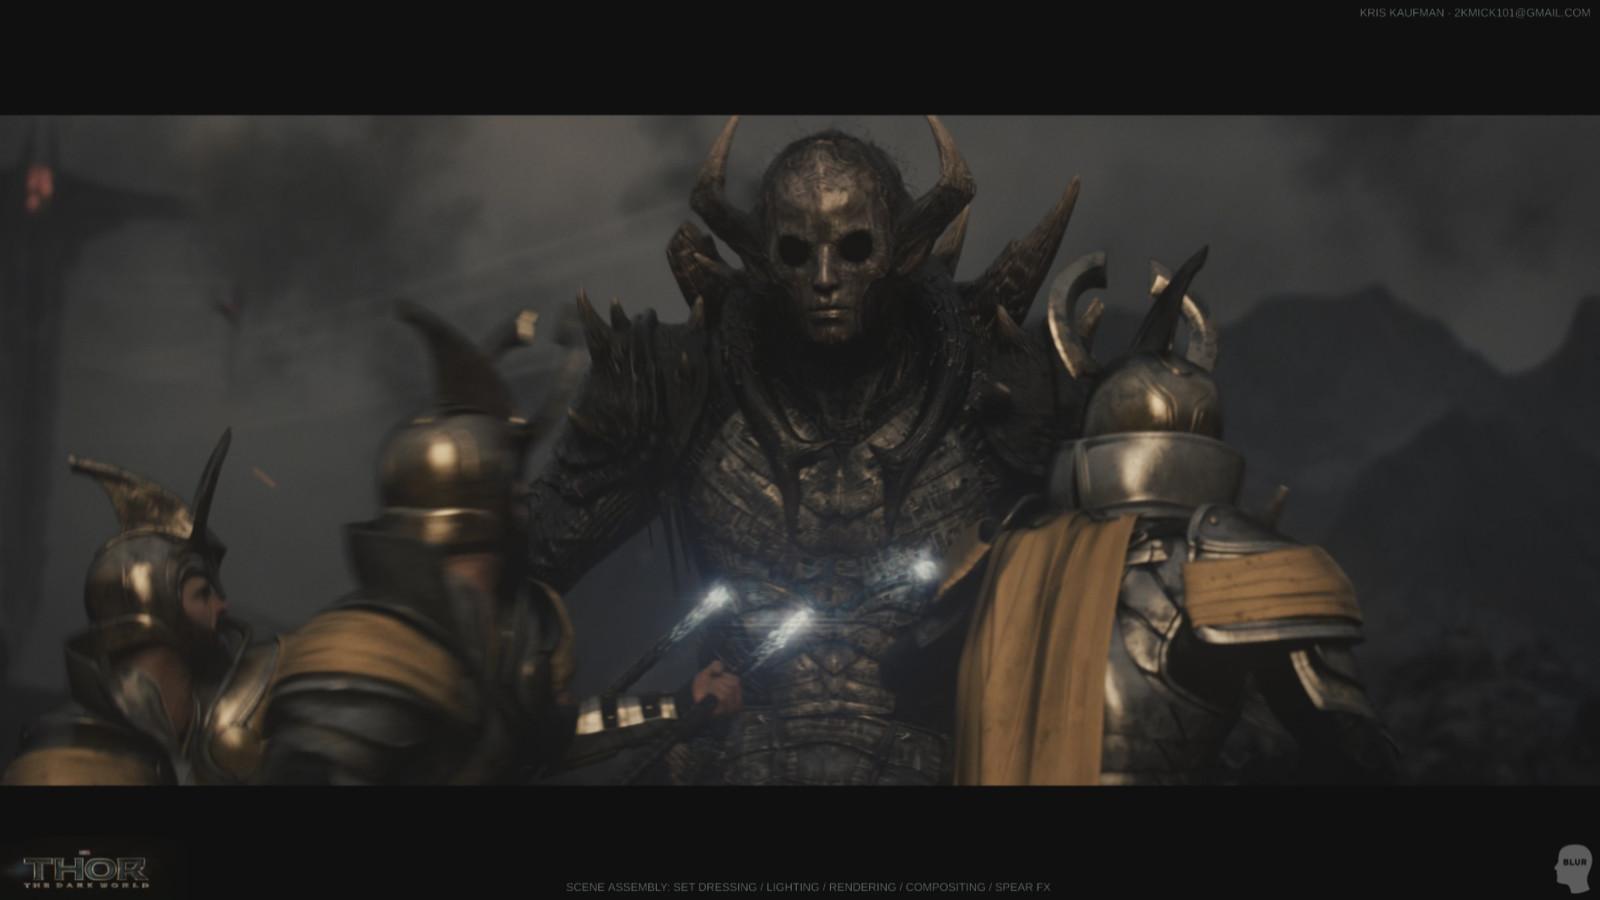 Thor: The Dark World: Set Dressing / Lighting / Rendering / Compositing